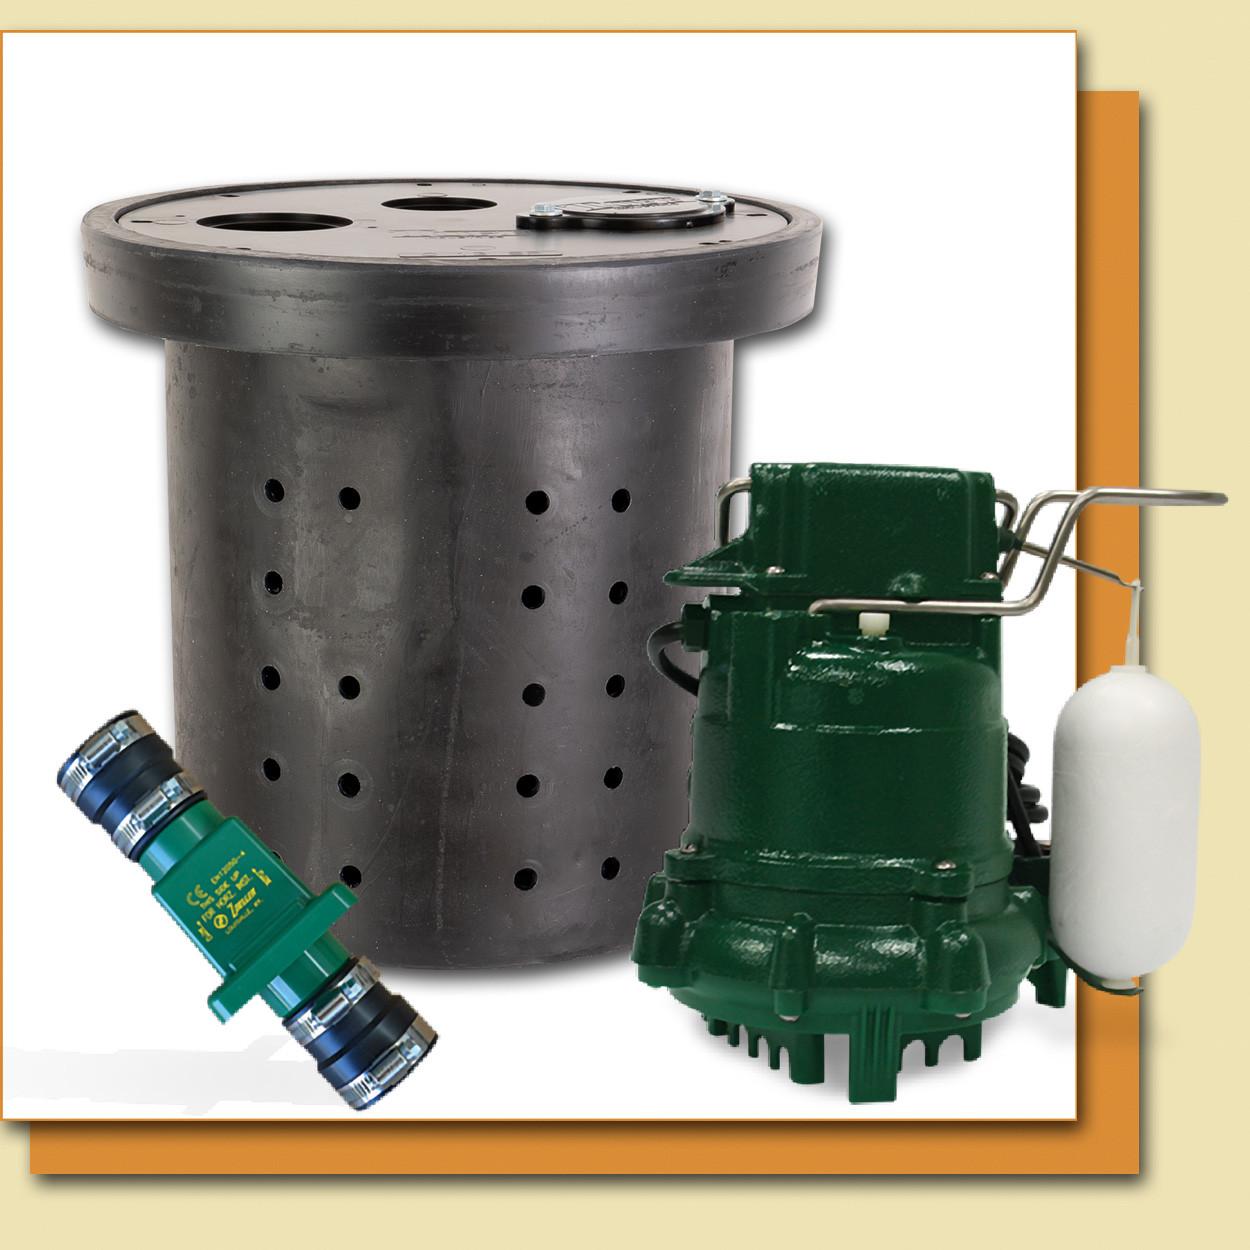 hight resolution of  zoeller sump pumps home depot zoeller model 53 basin valve